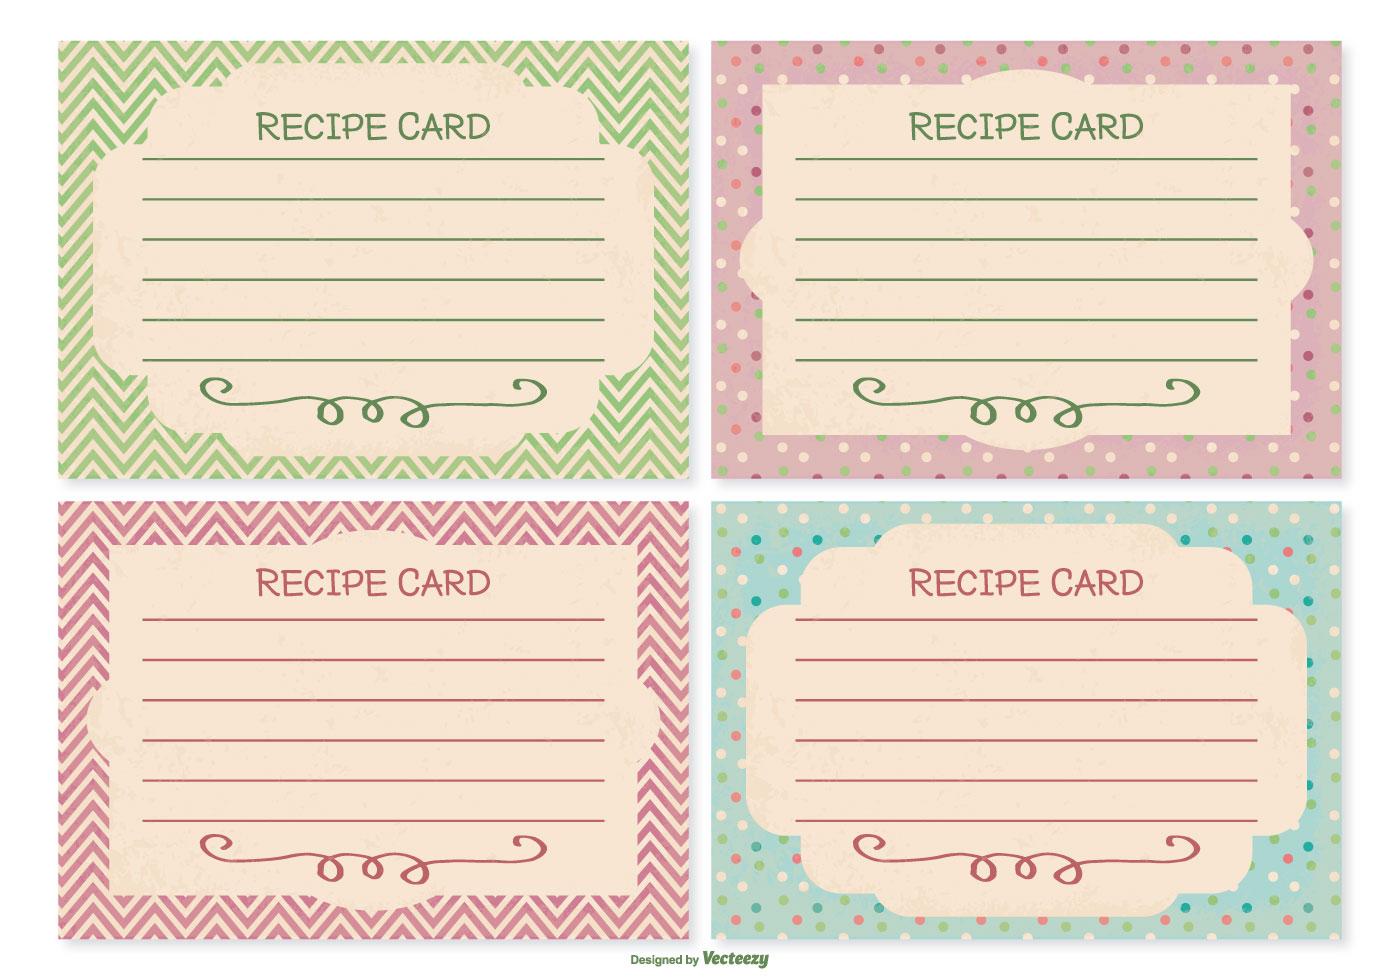 Retro Style Recipe Card Set Download Free Vector Art